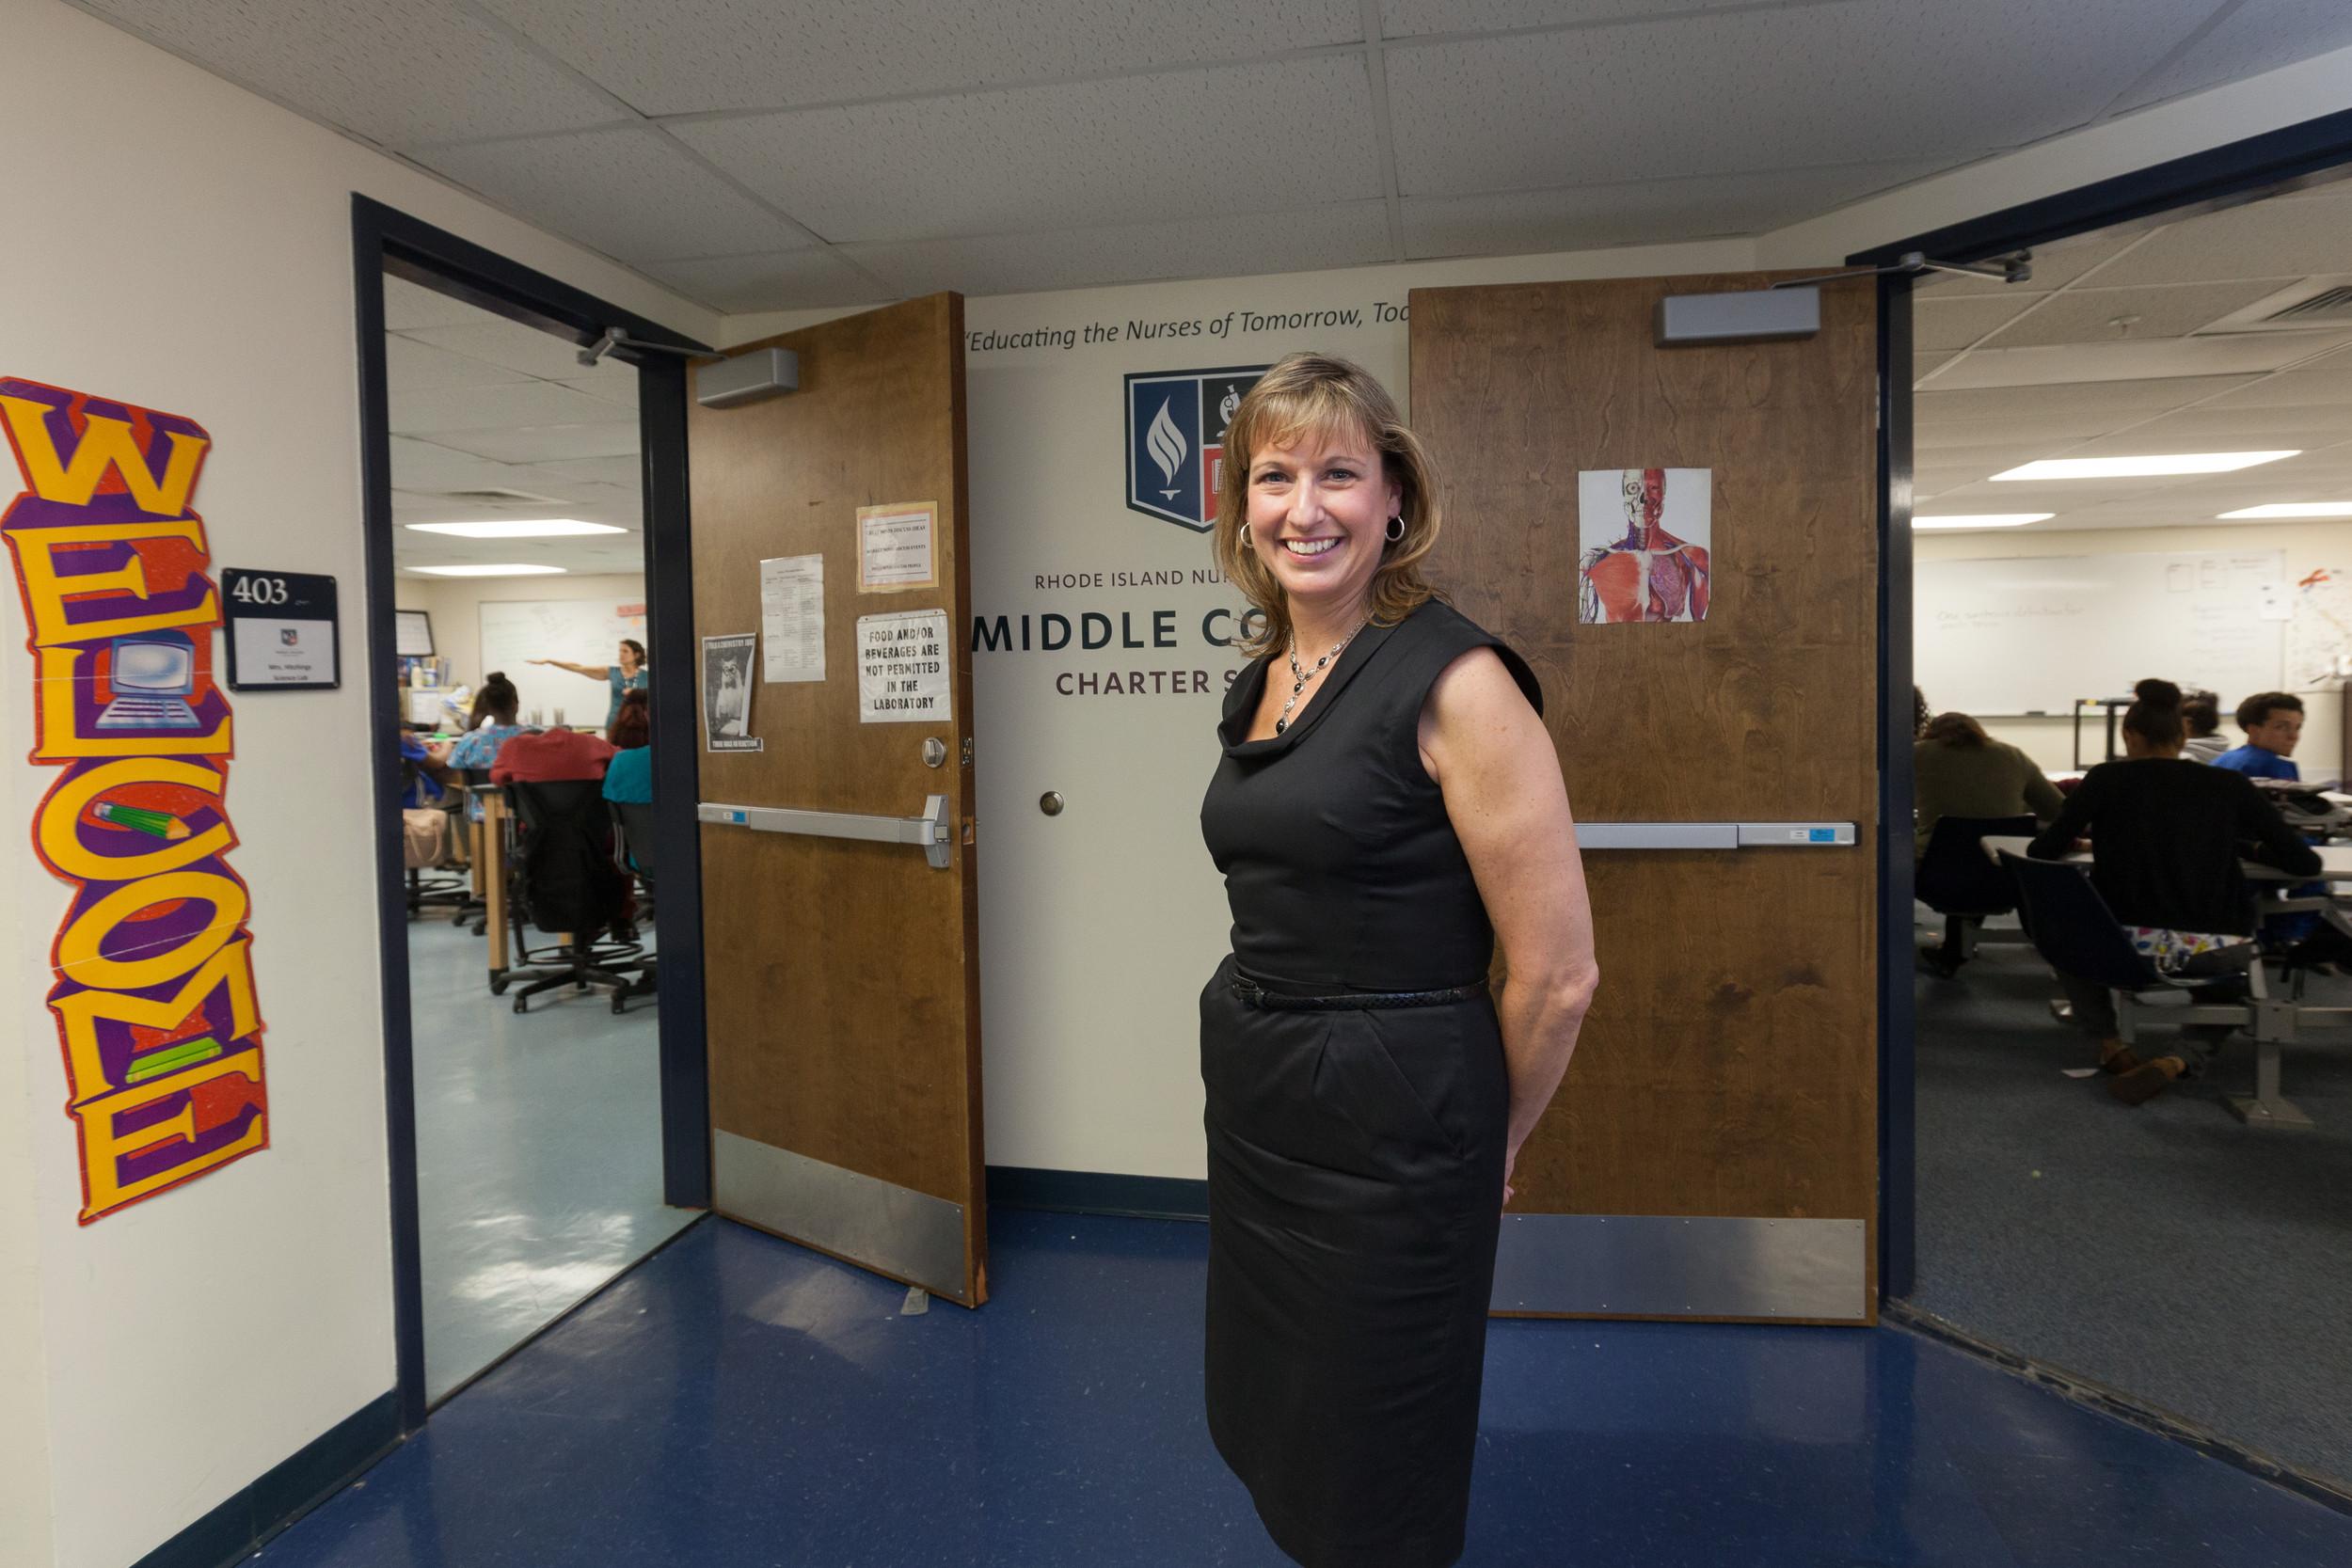 Rhode Island Nursing Charter School